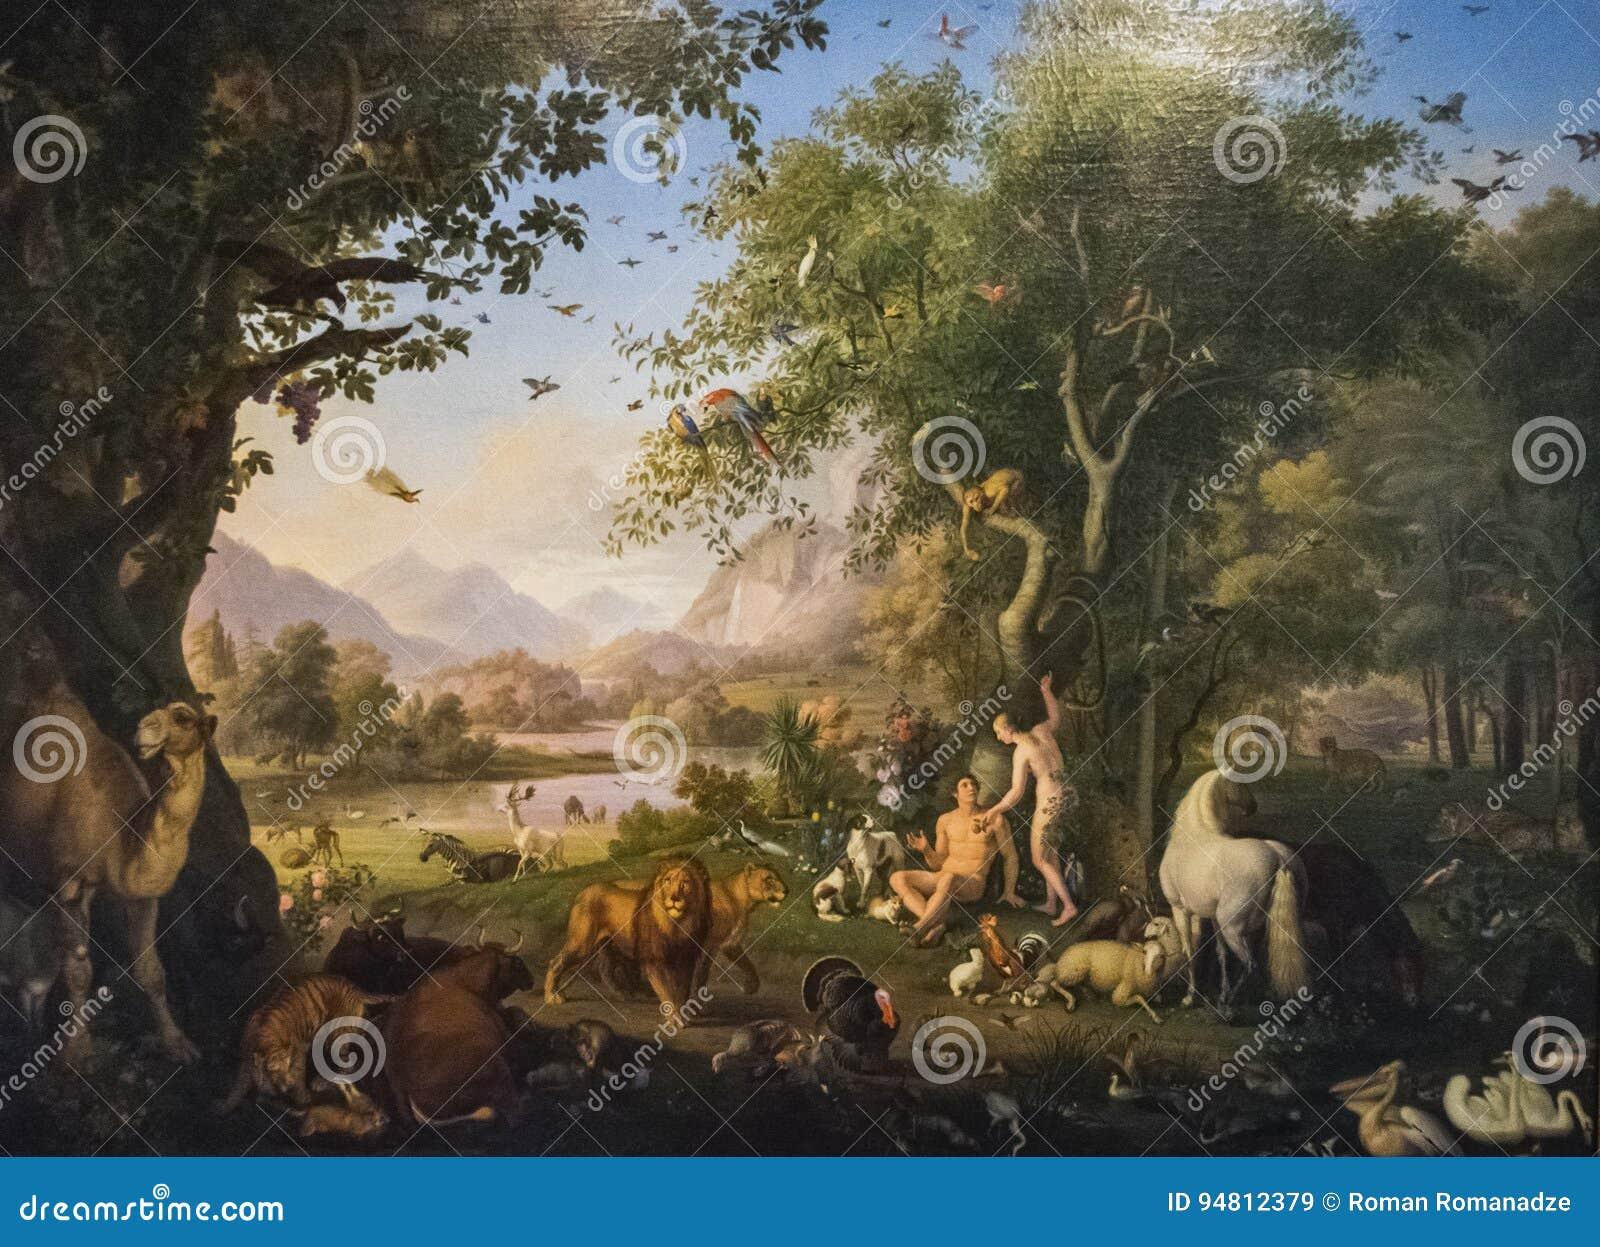 Original Painting Adam And Eve In The Garden Of Eden Editorial Stock ...